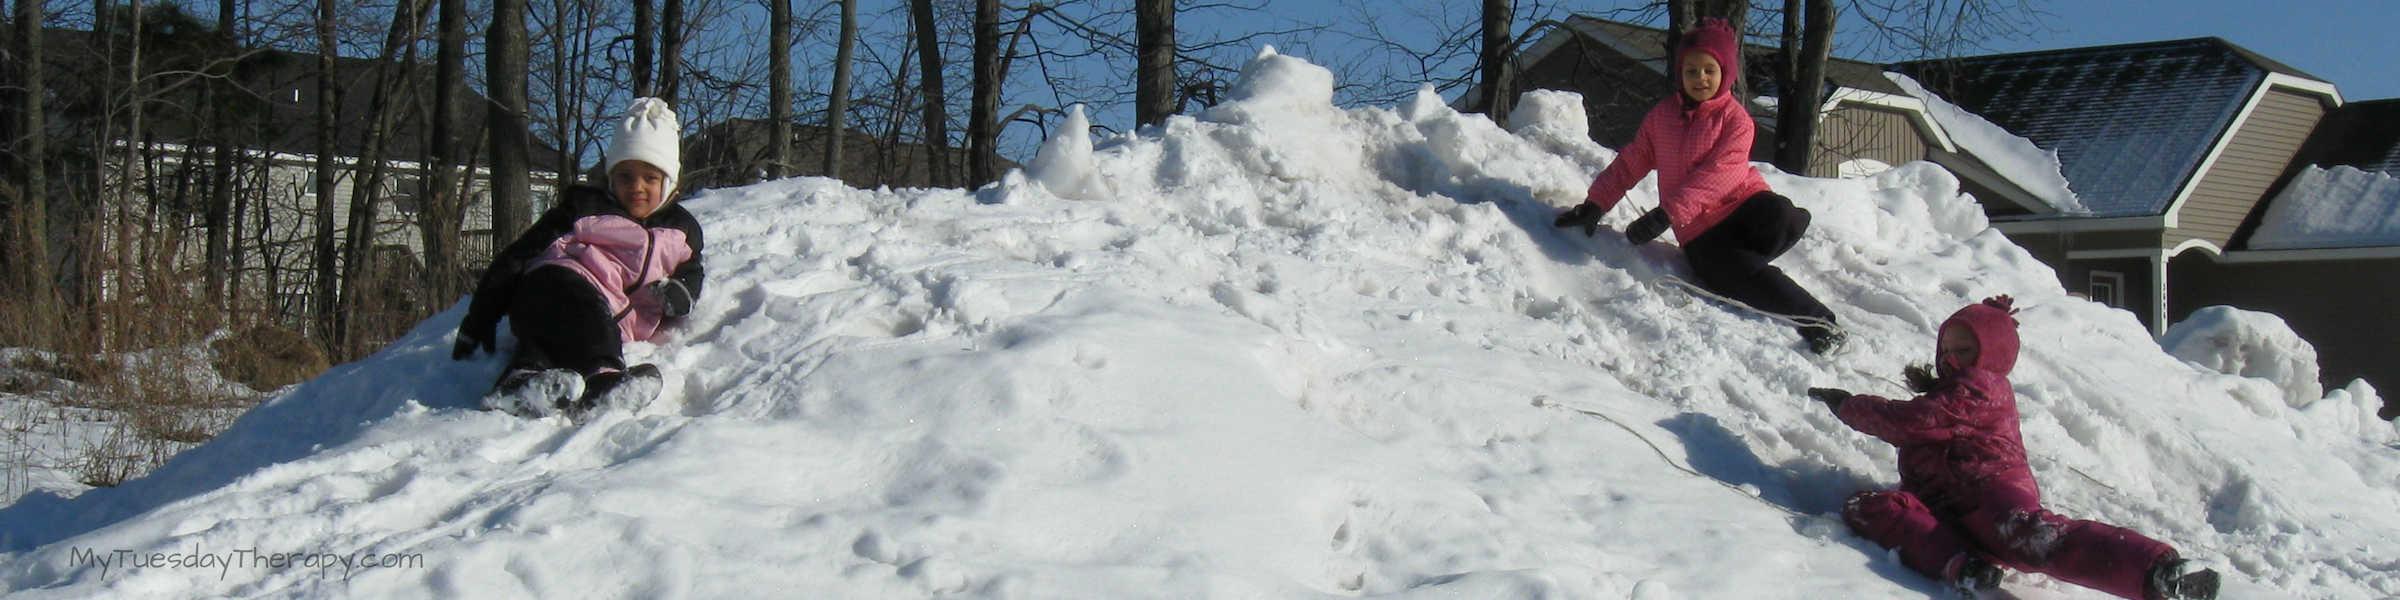 slider winter